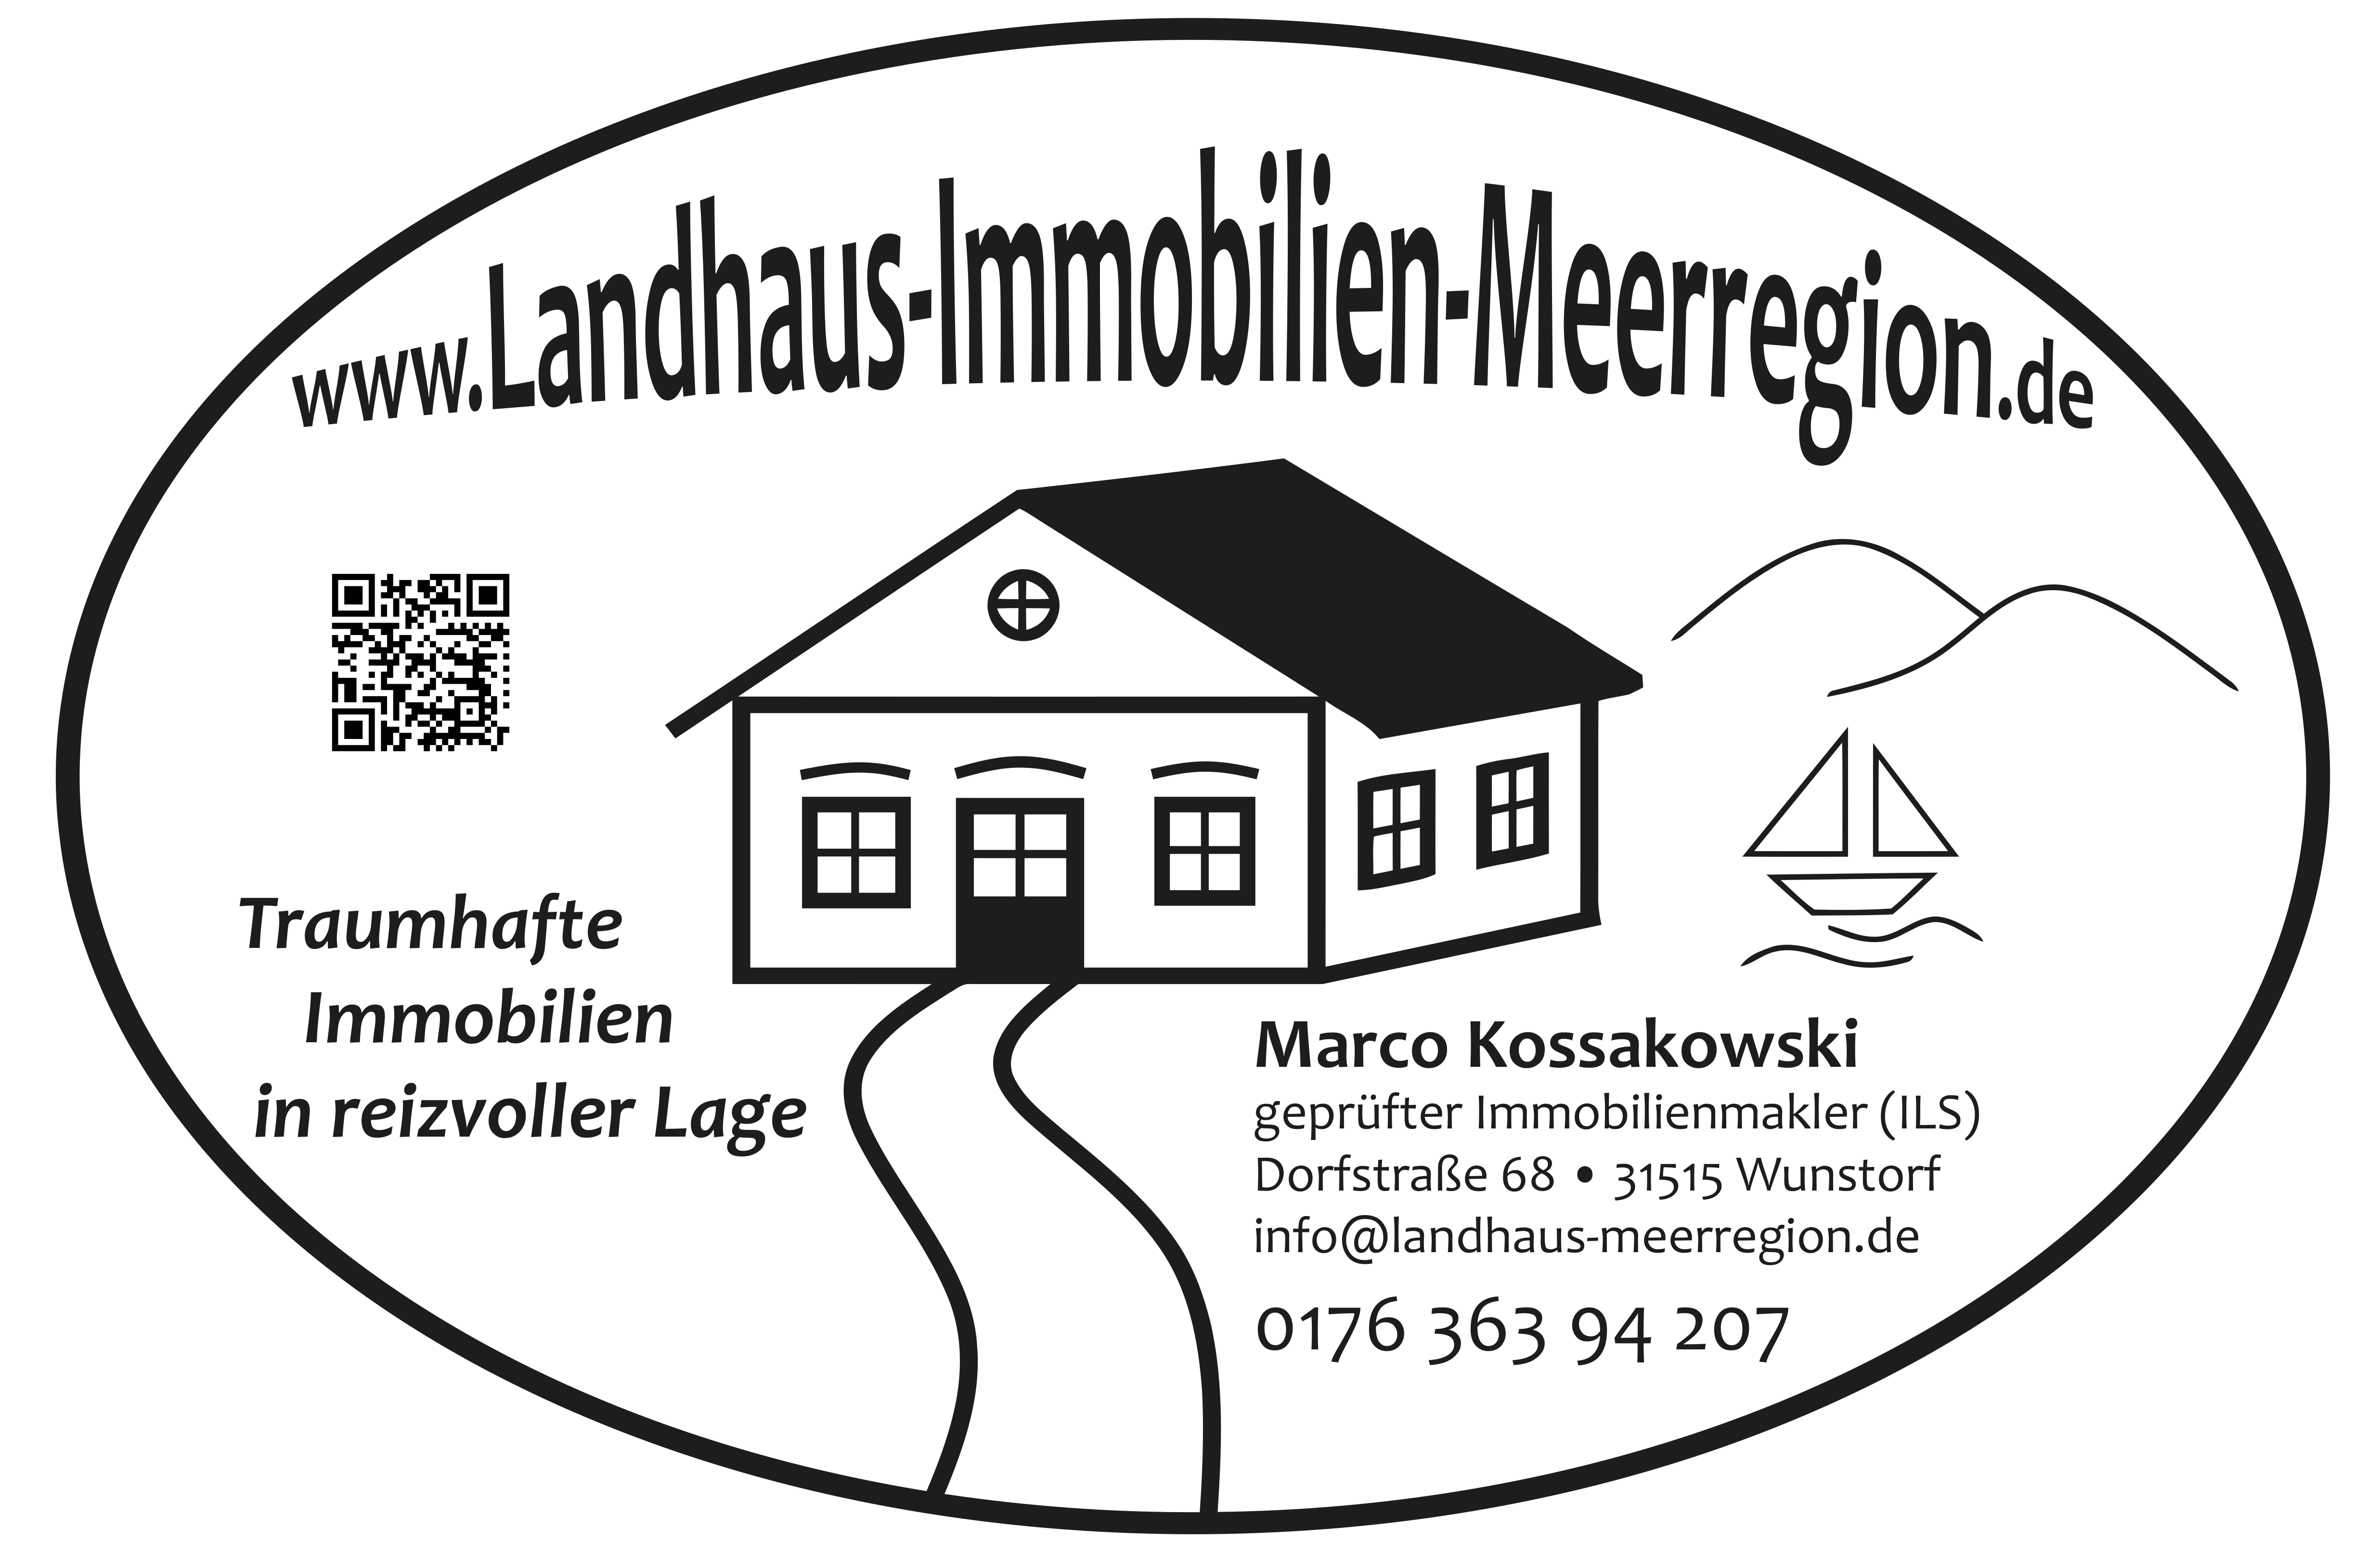 Landhaus Immobilien Meerregion oval